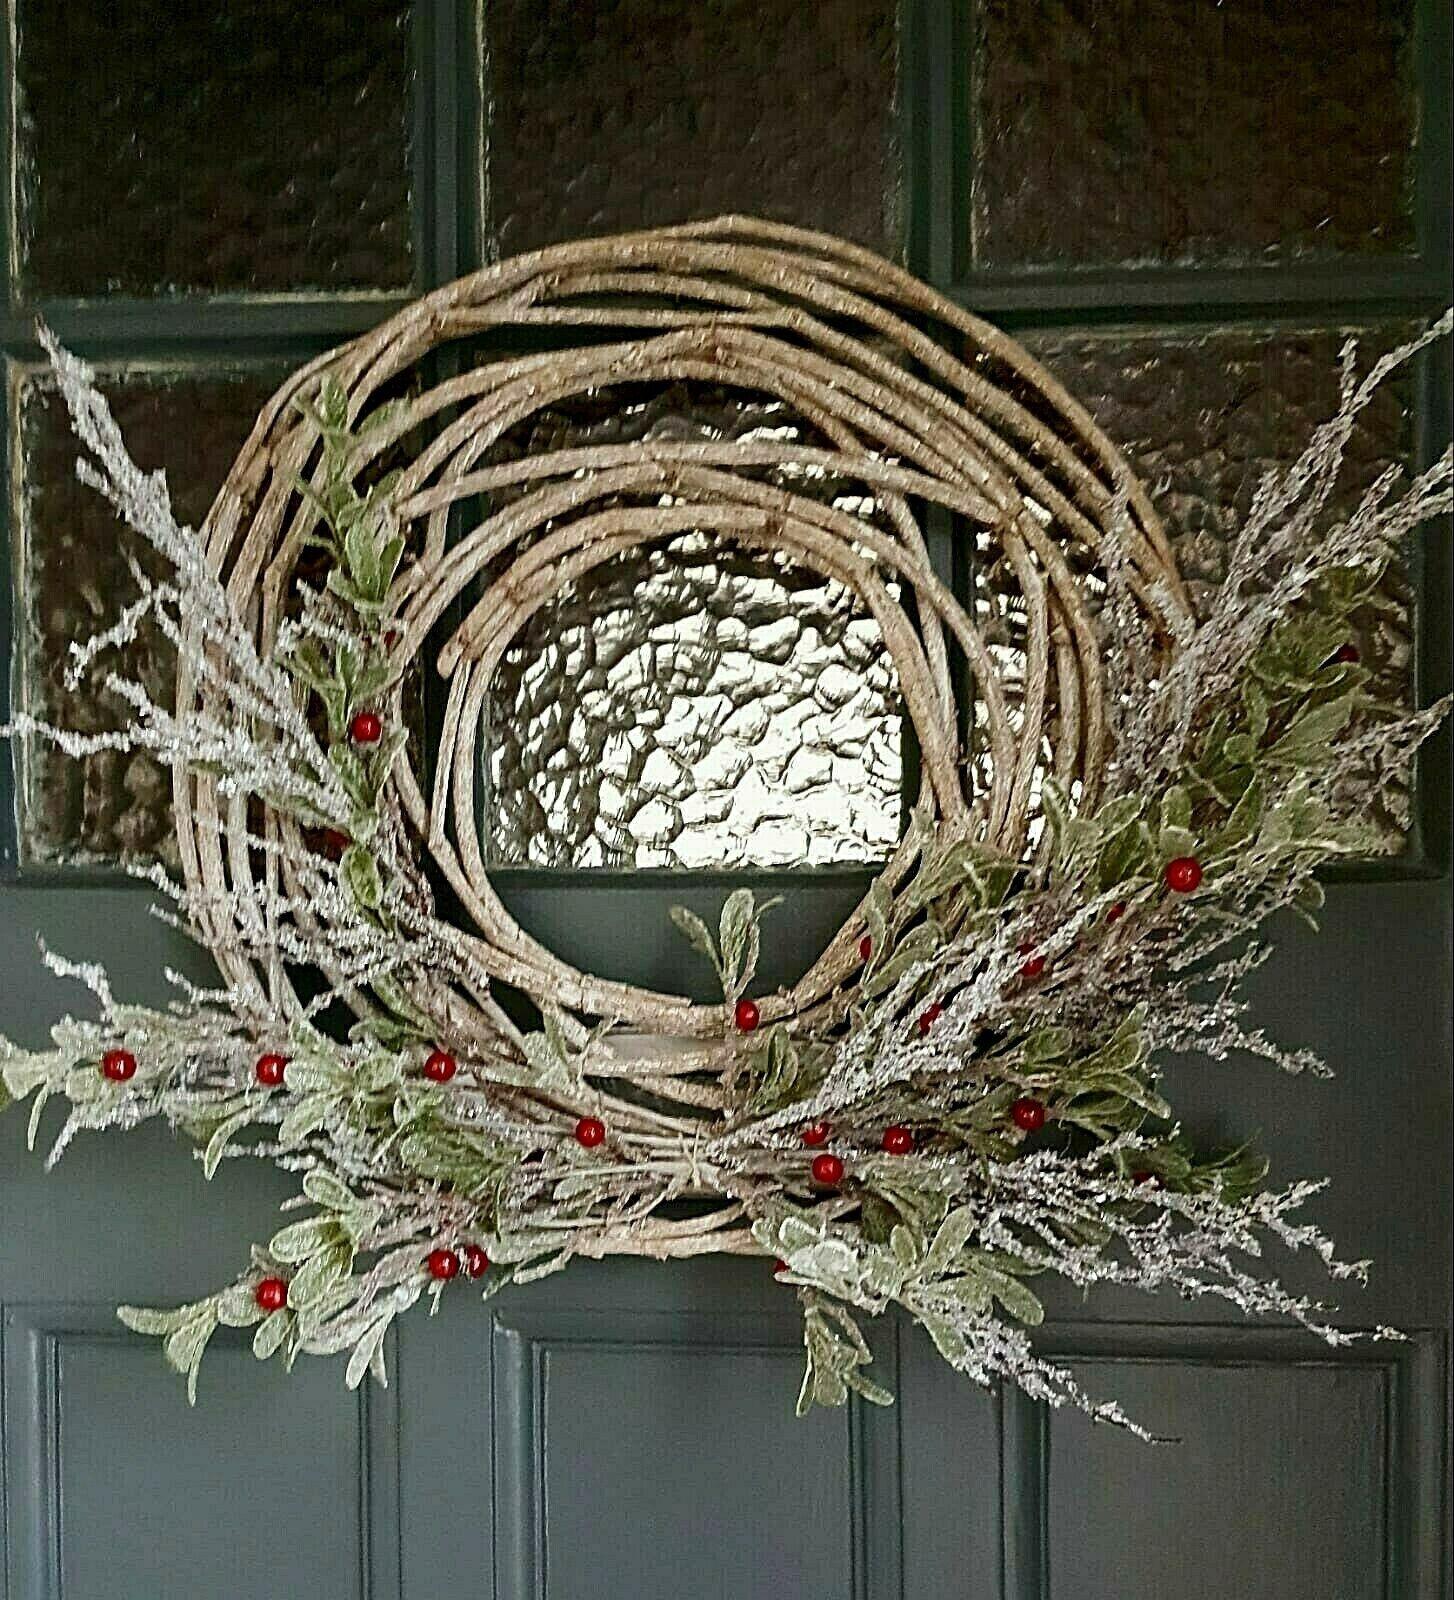 Green Frosted Glitter Eucalyptus Christmas Wreath For Sale Ebay